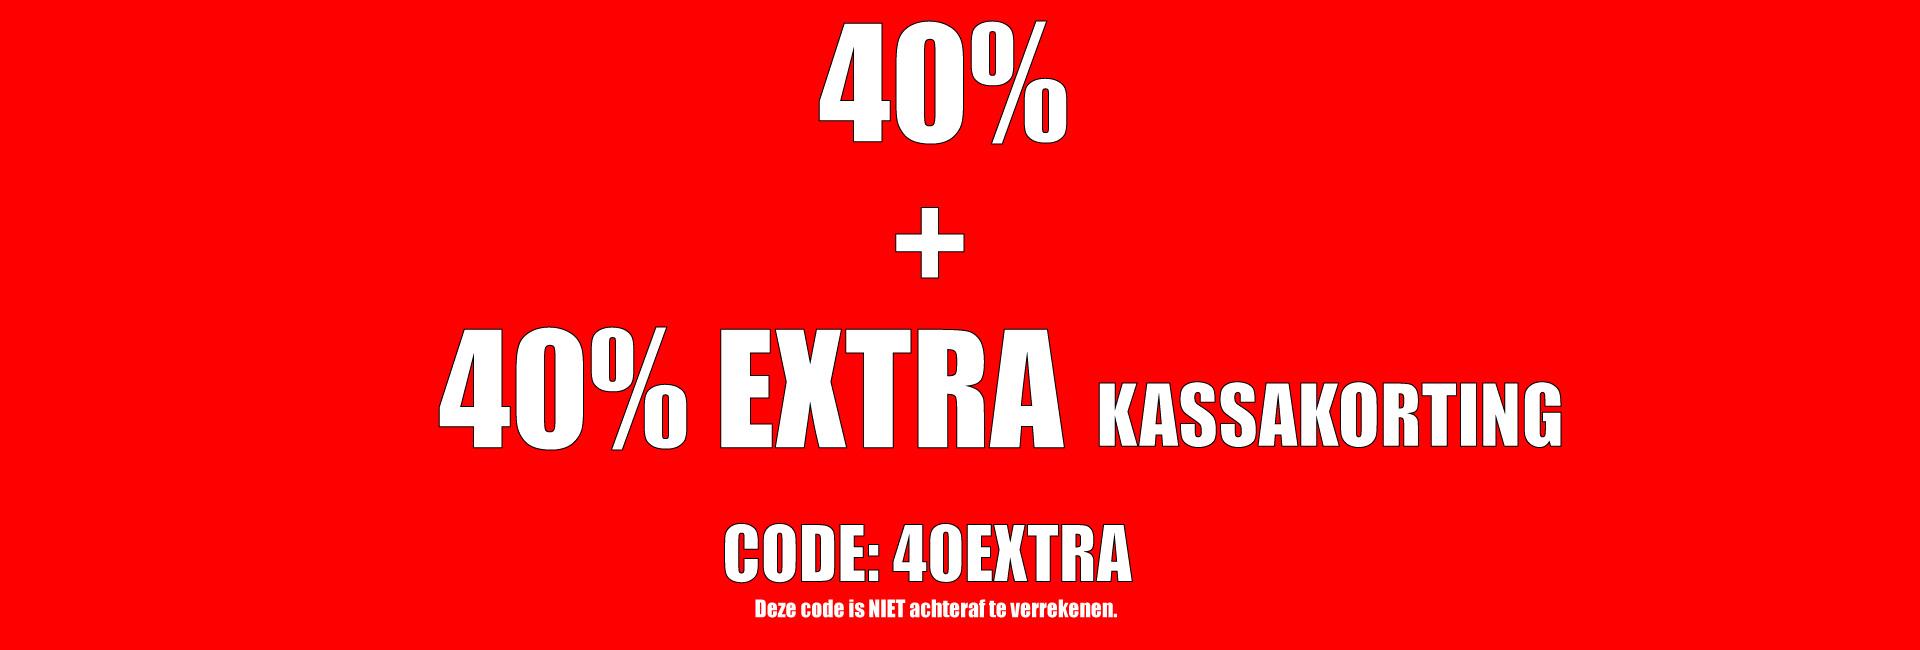 40 + 40% EXTRA